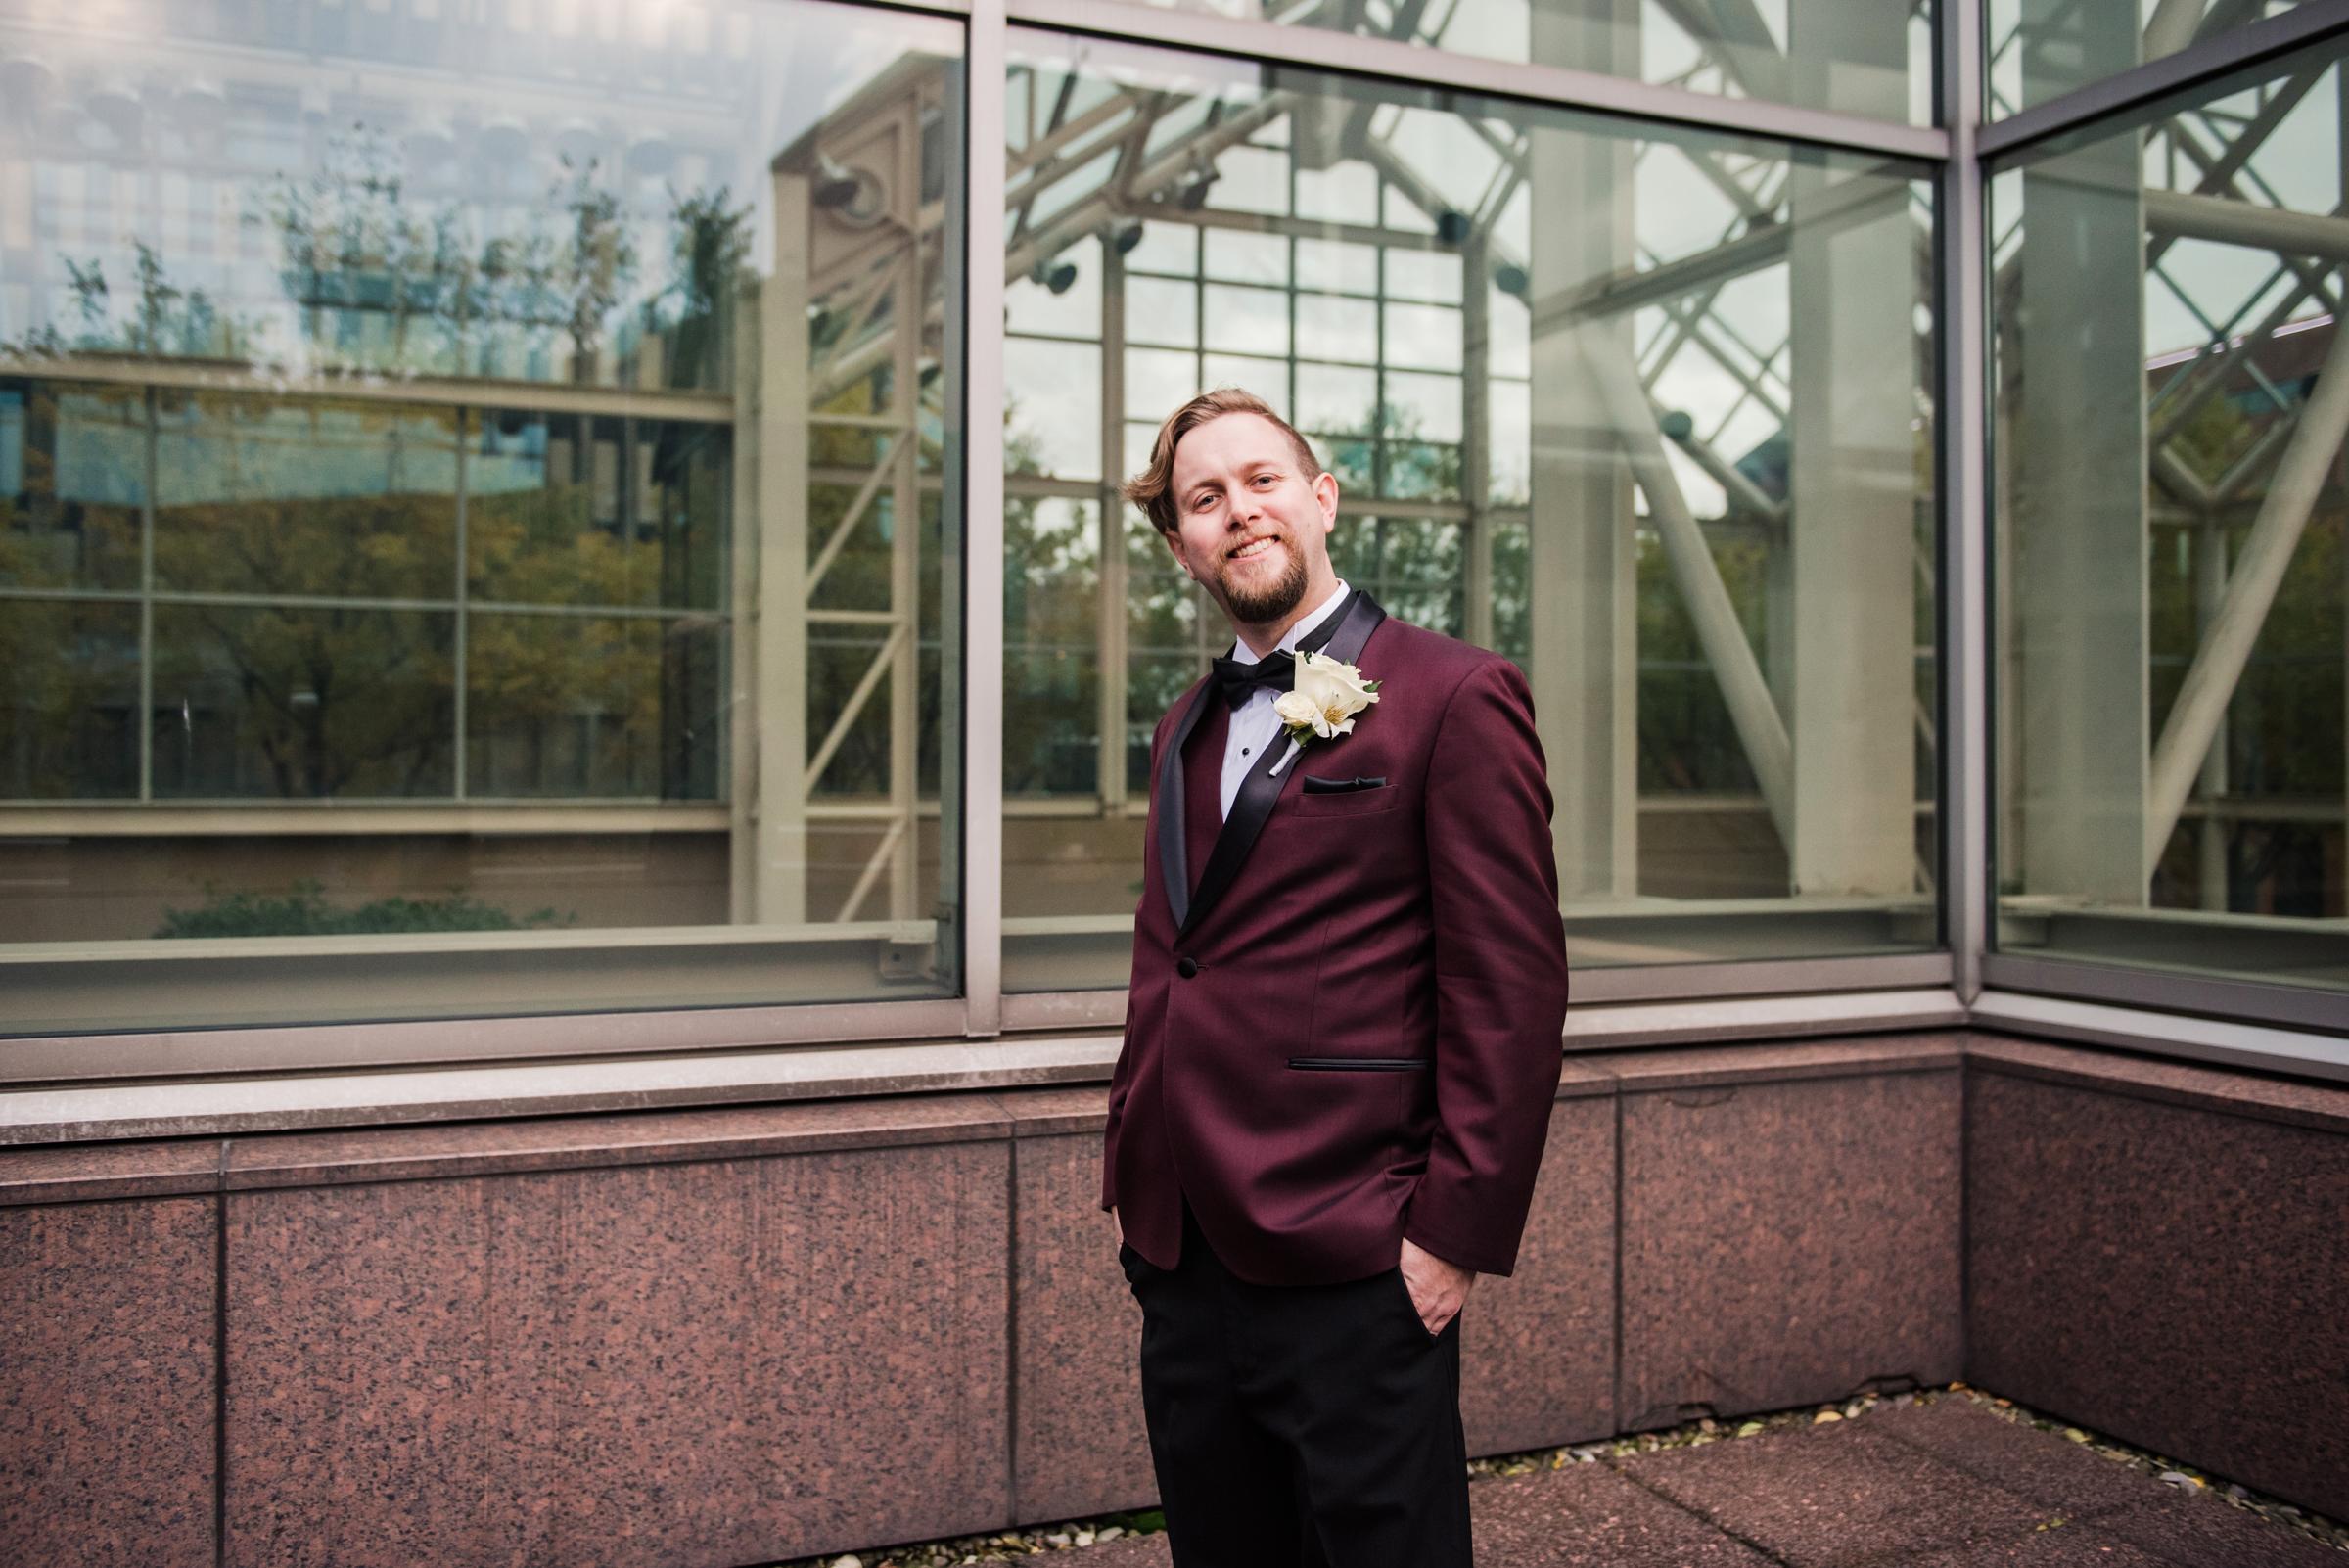 Wintergarden_by_Monroes_Rochester_Wedding_JILL_STUDIO_Rochester_NY_Photographer_173348.jpg